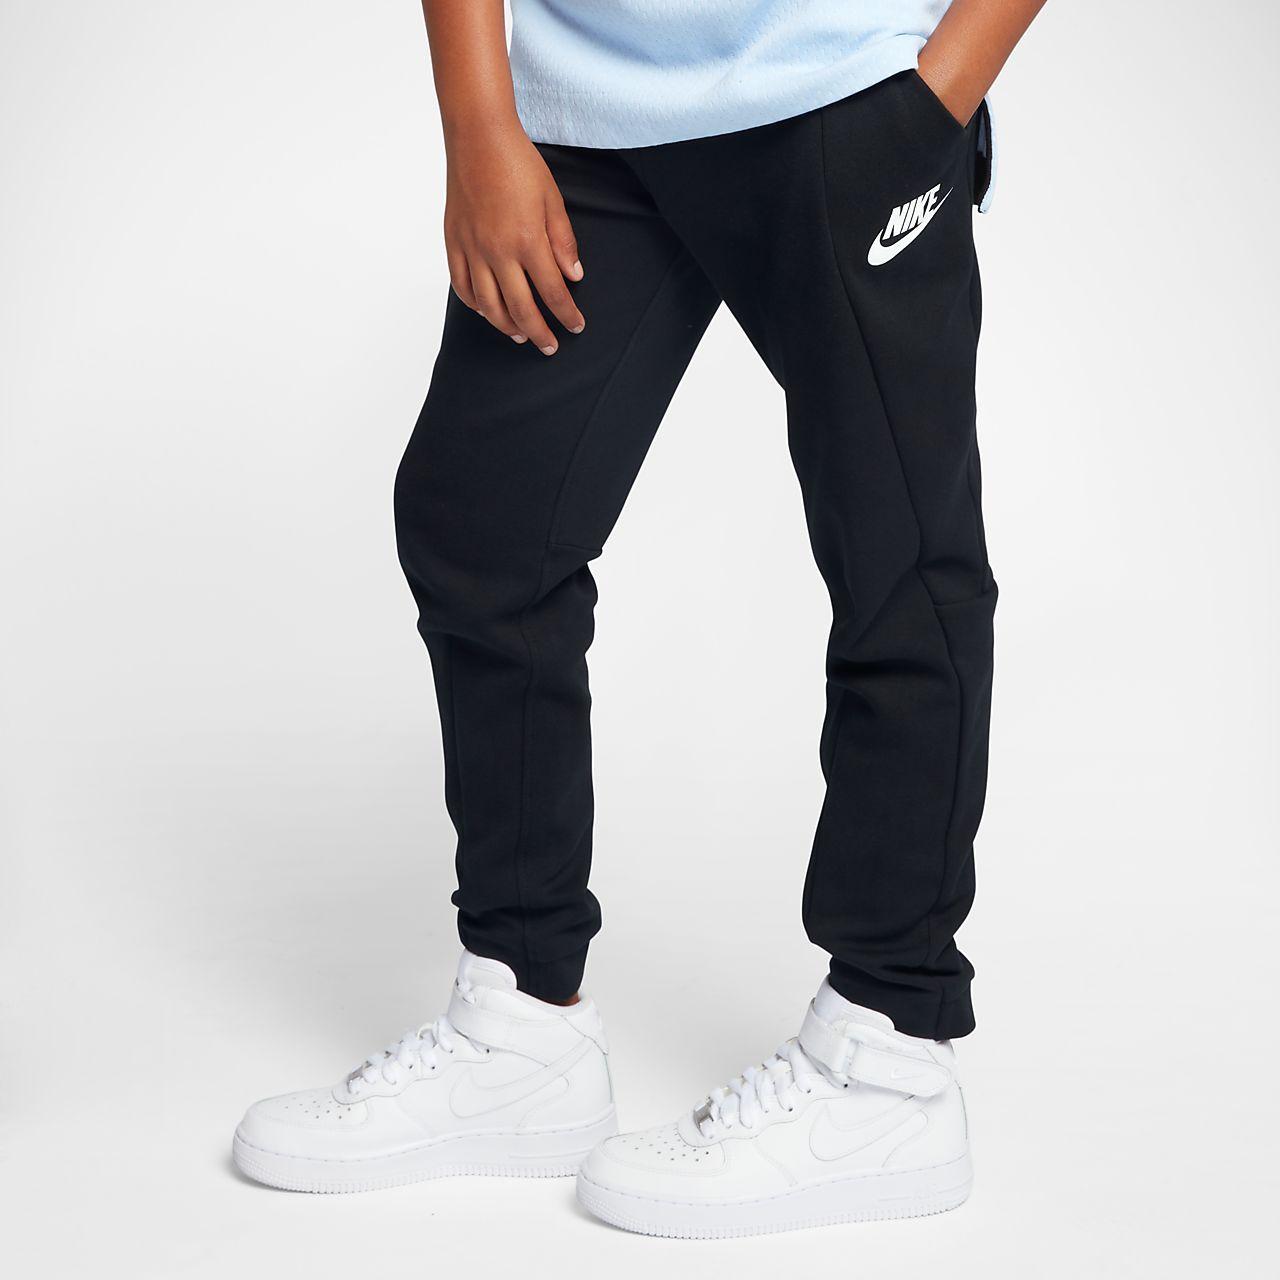 7e2de3a37de Nike Sportswear Tech Fleece Big Kids  (Girls ) Pants